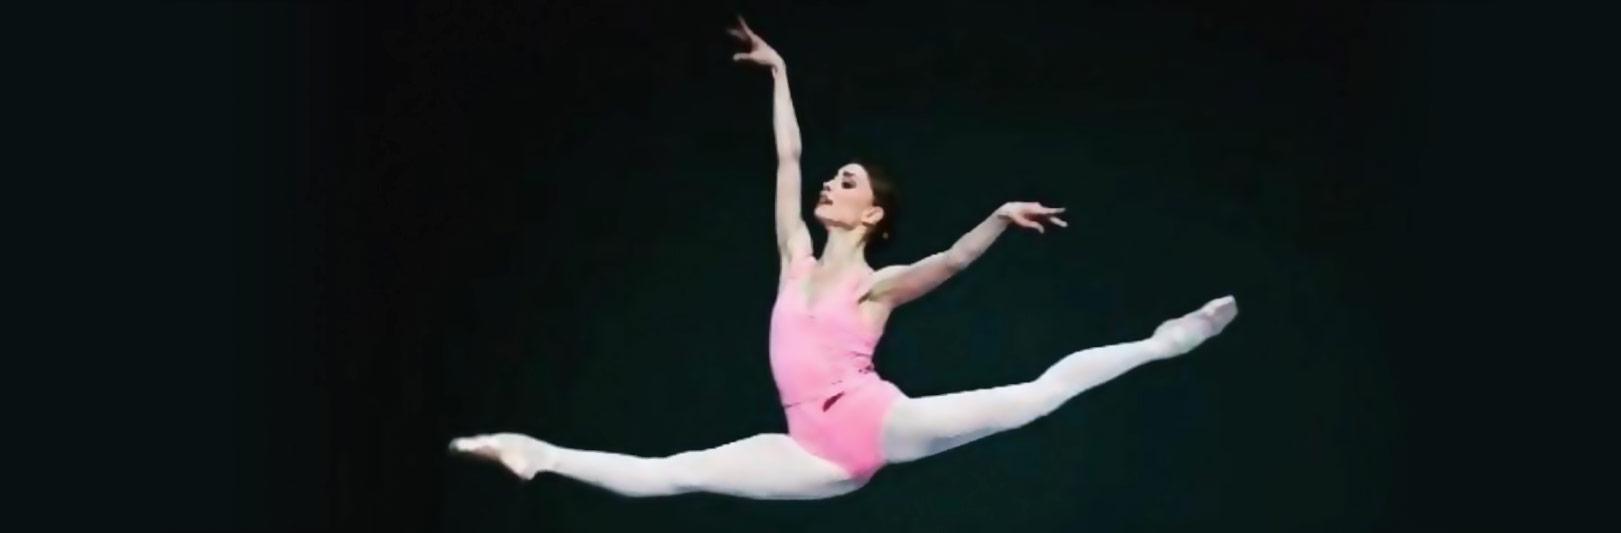 ballett fuer profis muenchen ballett schule - Ballet for Professionals